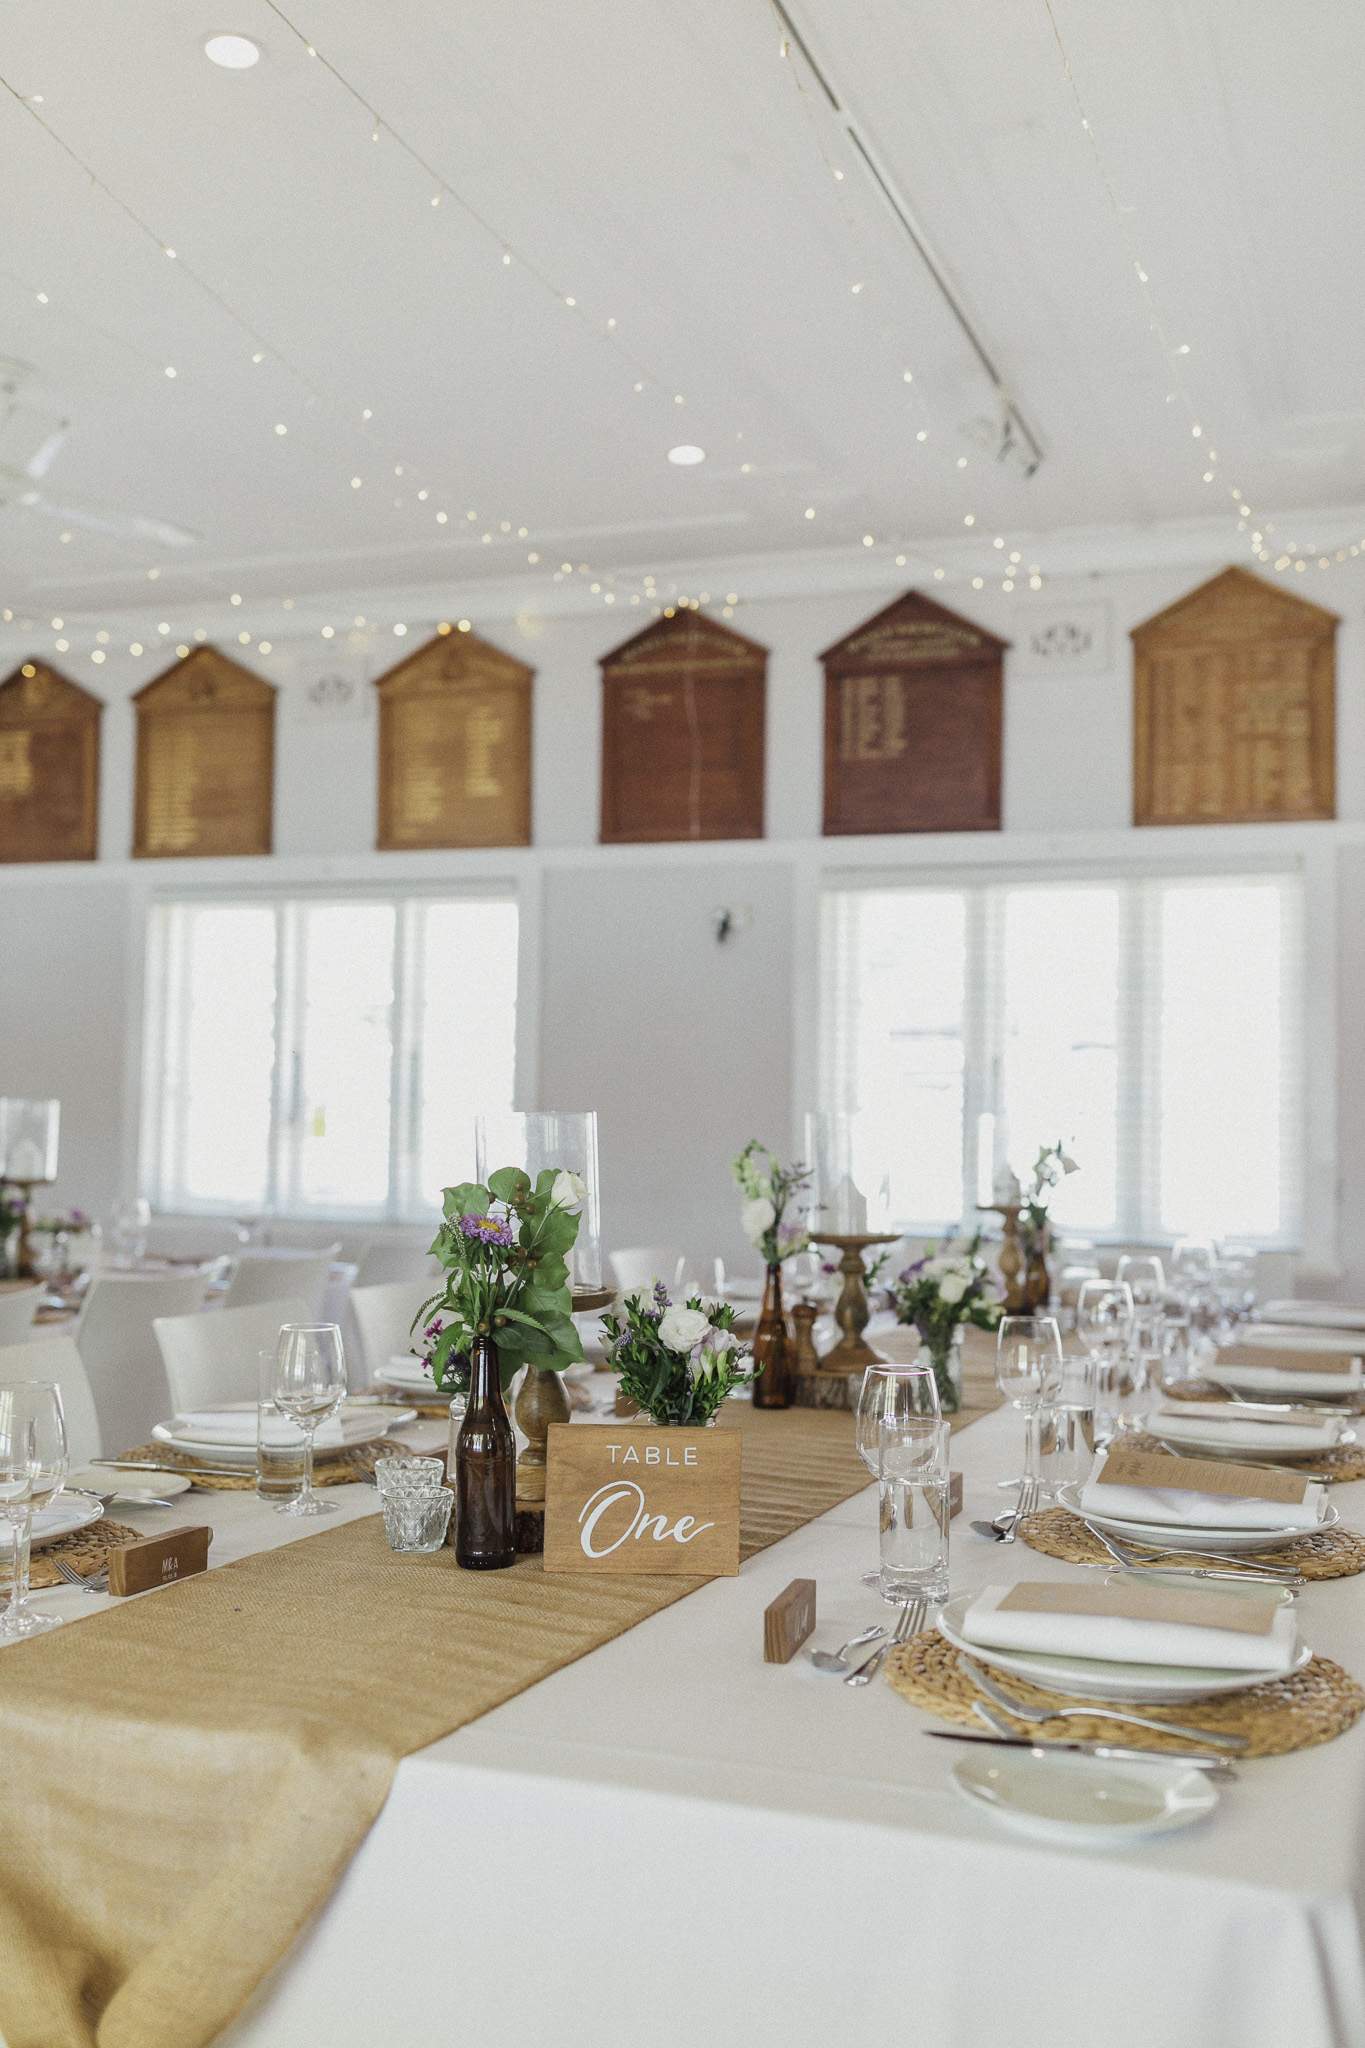 Rustic_Wedding_Table_Styling_Ideas.jpg